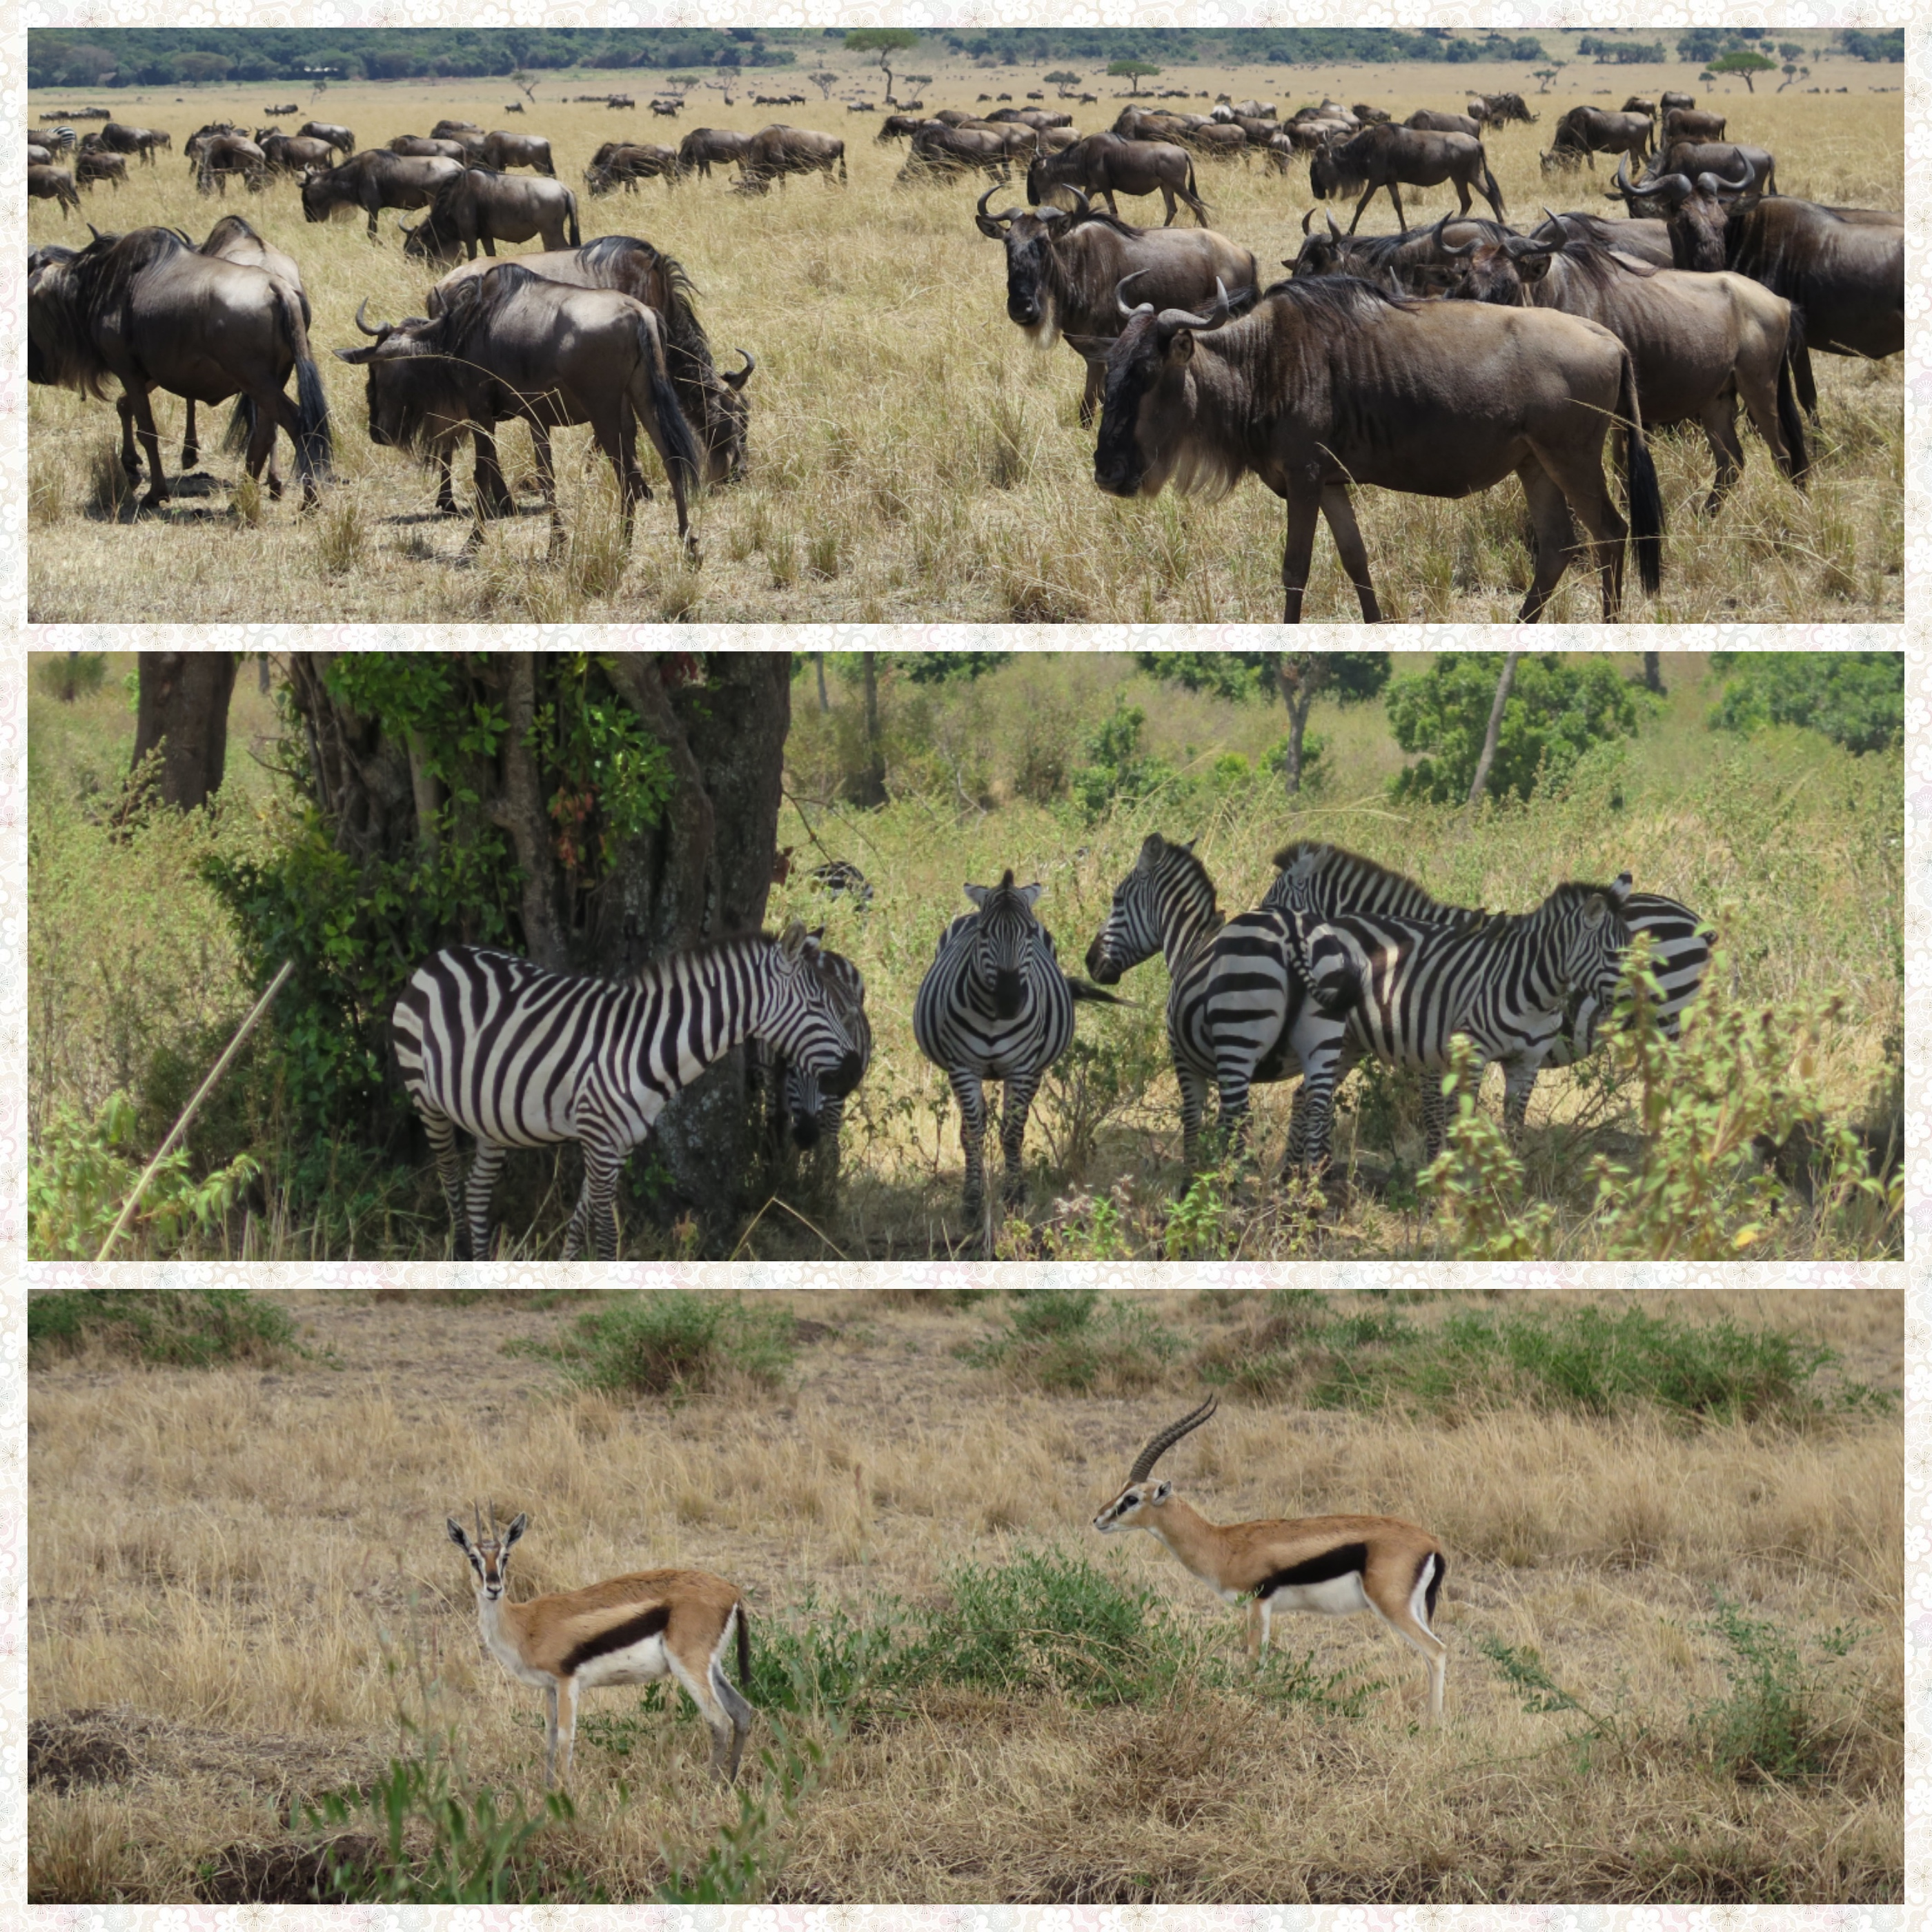 Wildebeest, Zebras and Thomsons Gazelle